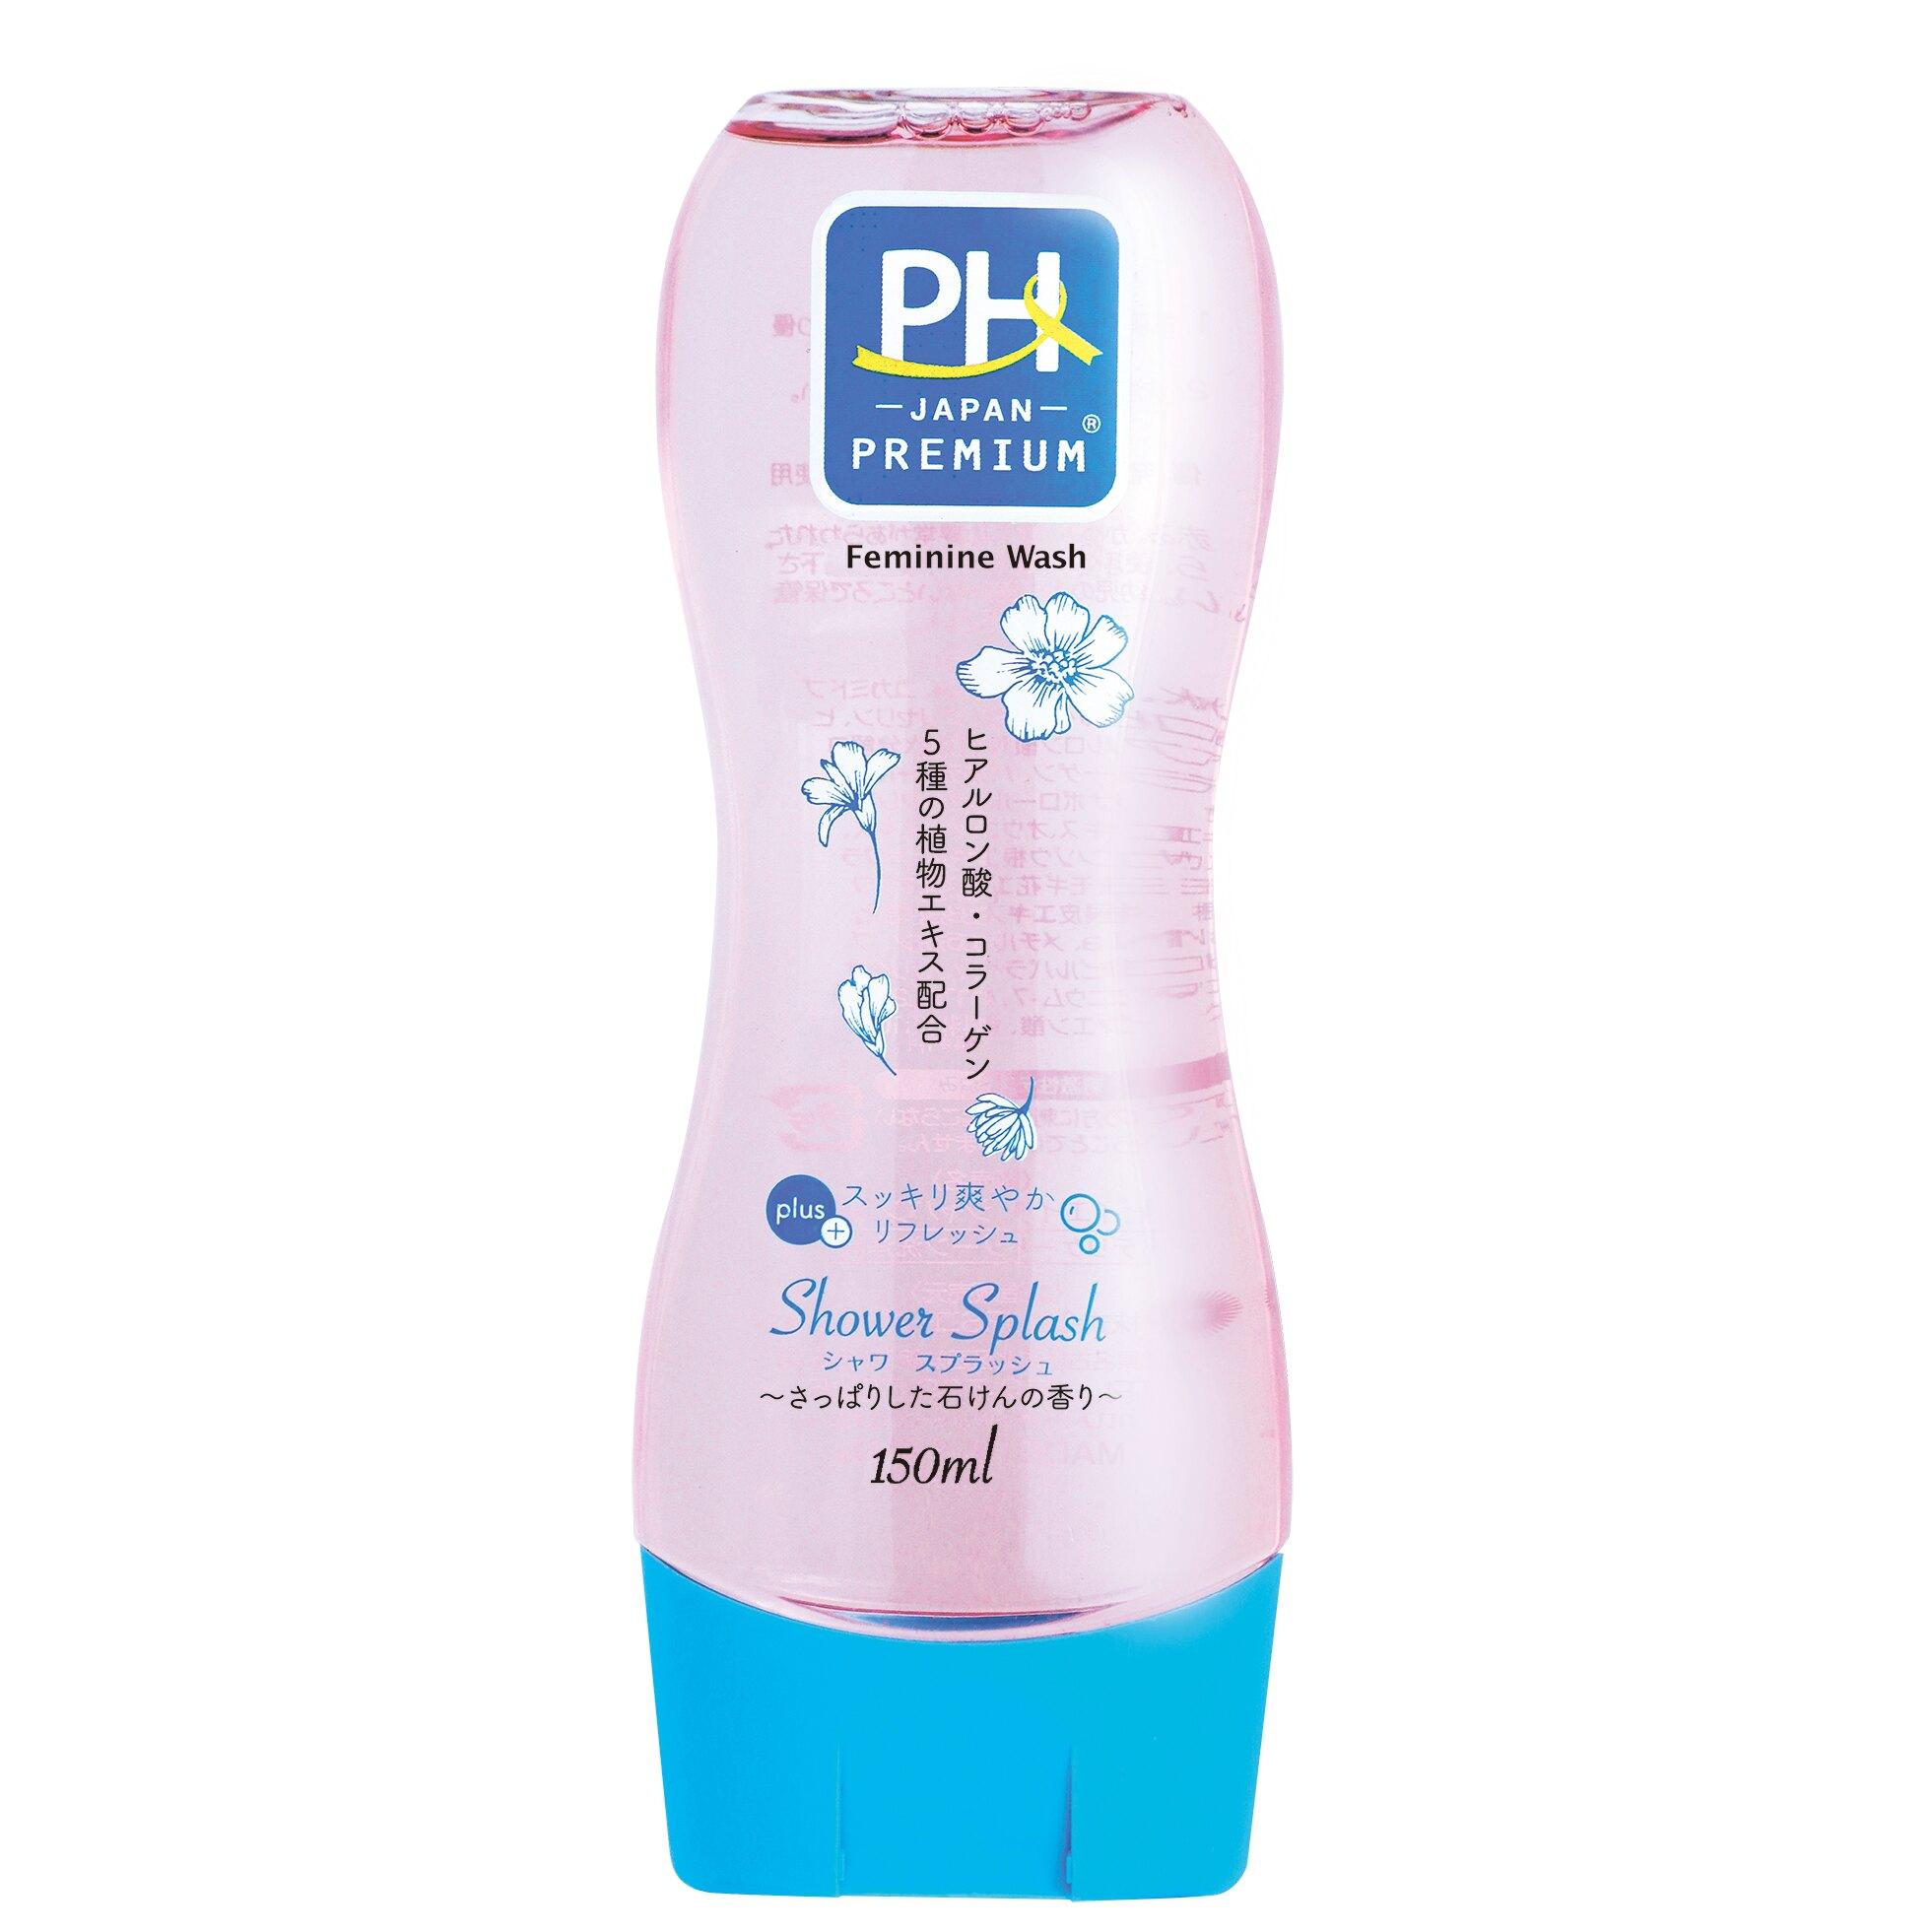 PH JAPAN 女性私處護理清潔洗液 (沐浴皂香) - 日本必買 日本樂天熱銷Top 日本樂天熱銷